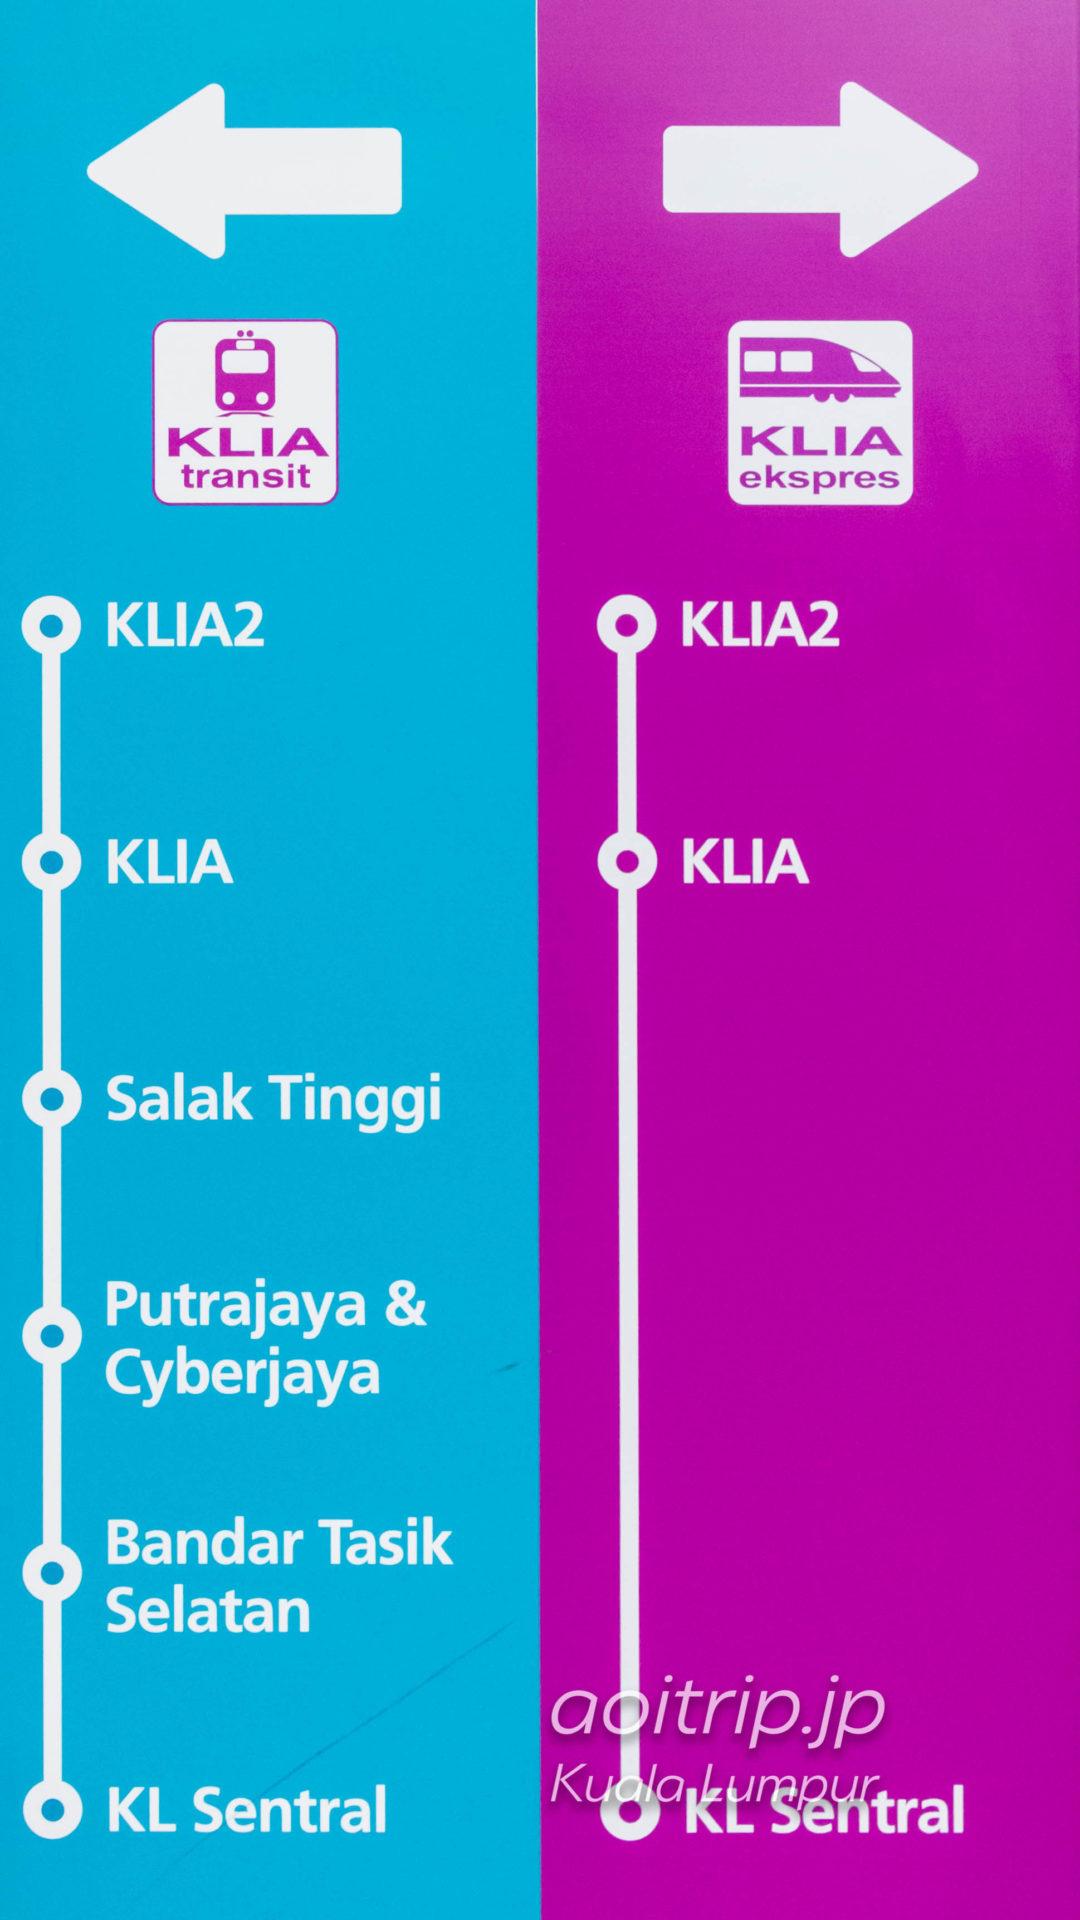 KLIAエクスプレス & KLIAトランジットの路線図